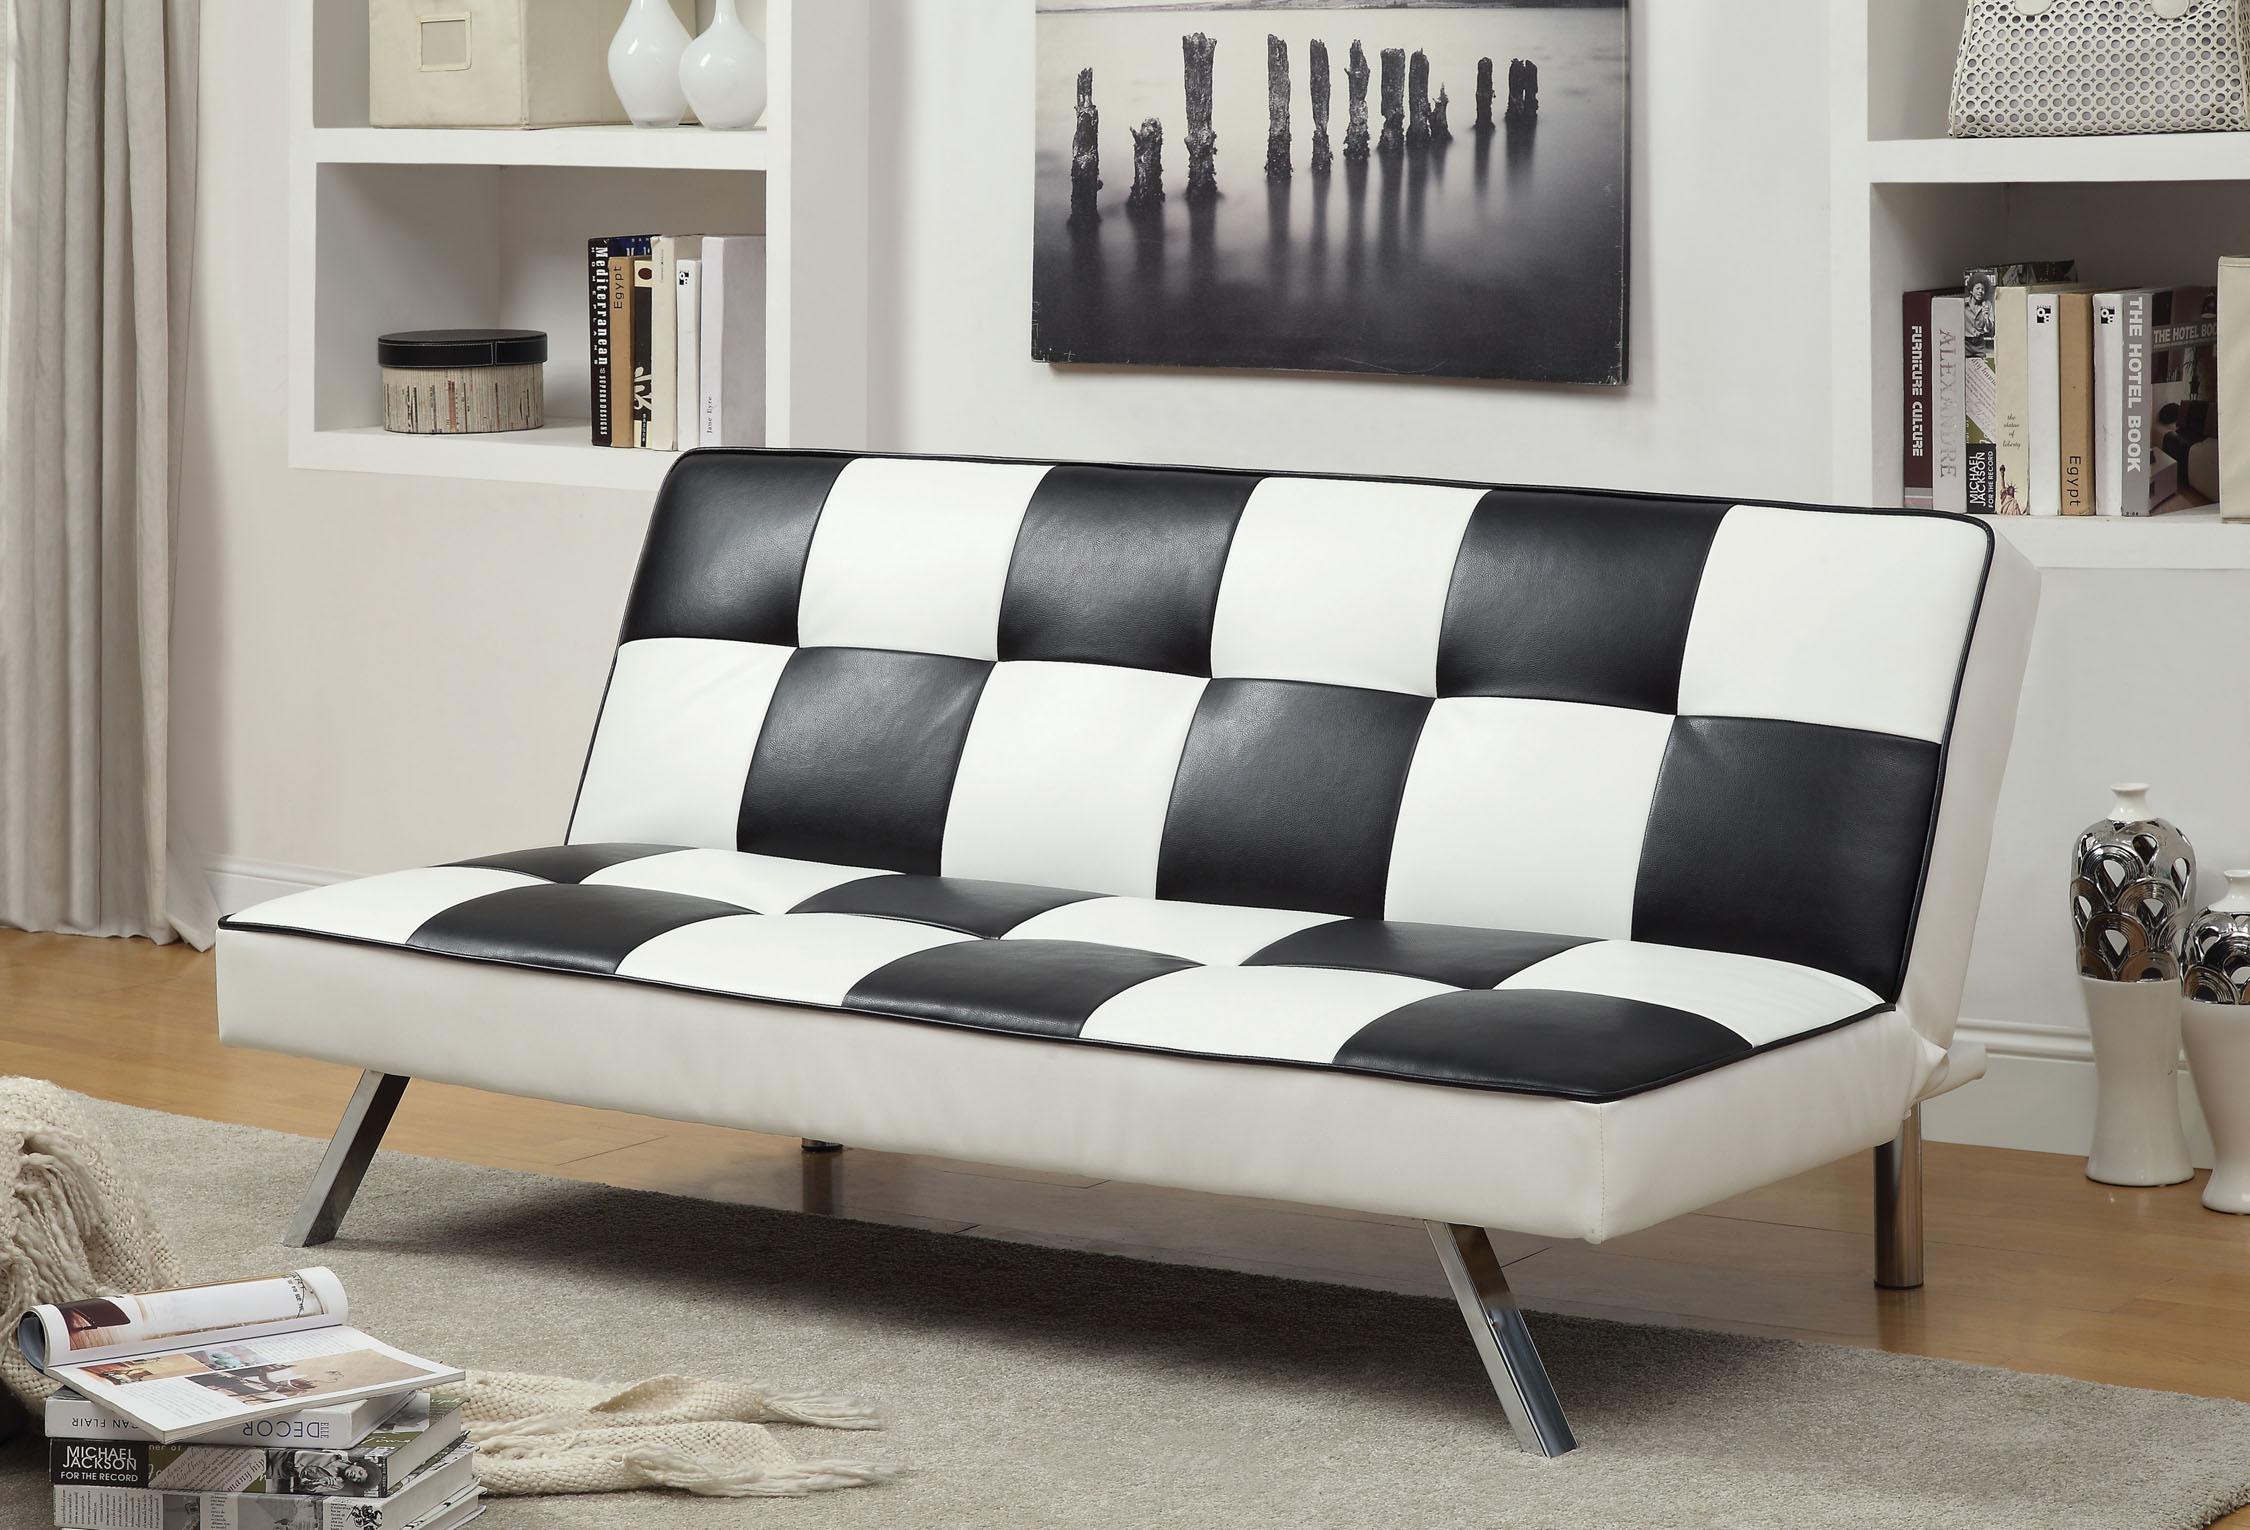 Furniture Of America Checkered Black White Leatherette